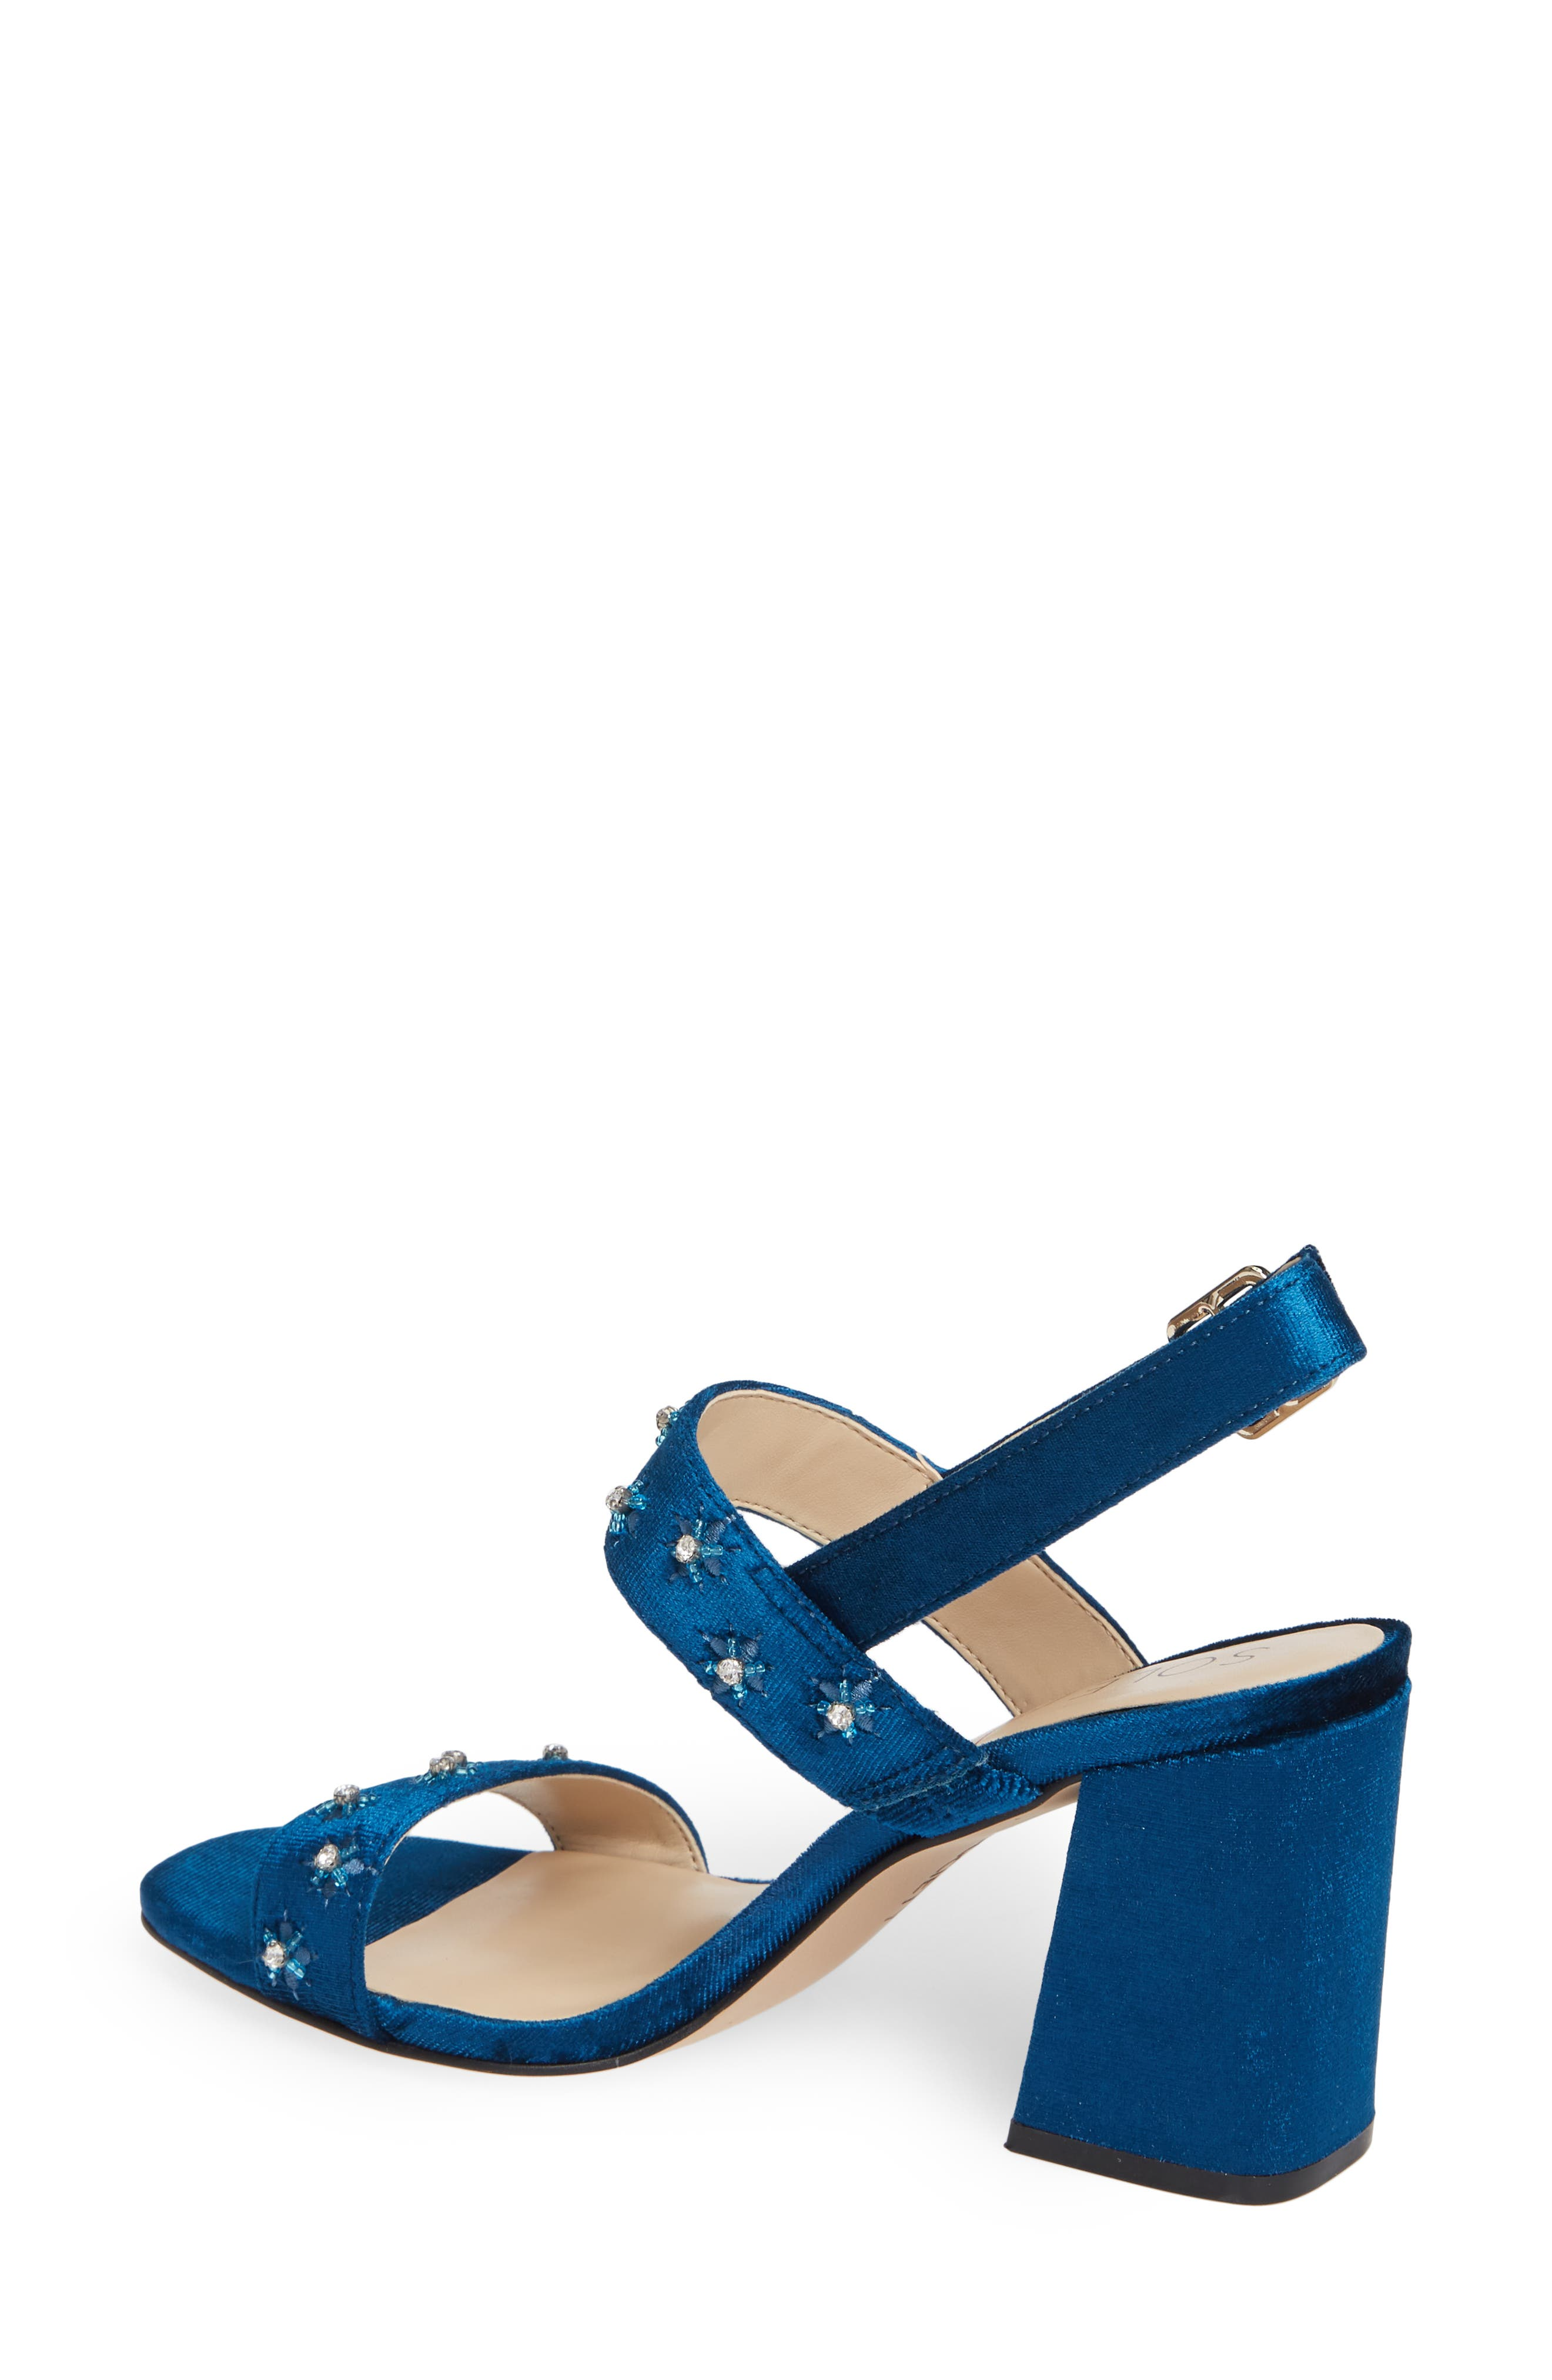 SOLE SOCIETY, Jessibel Sandal, Alternate thumbnail 2, color, CERULEAN BLUE VELVET